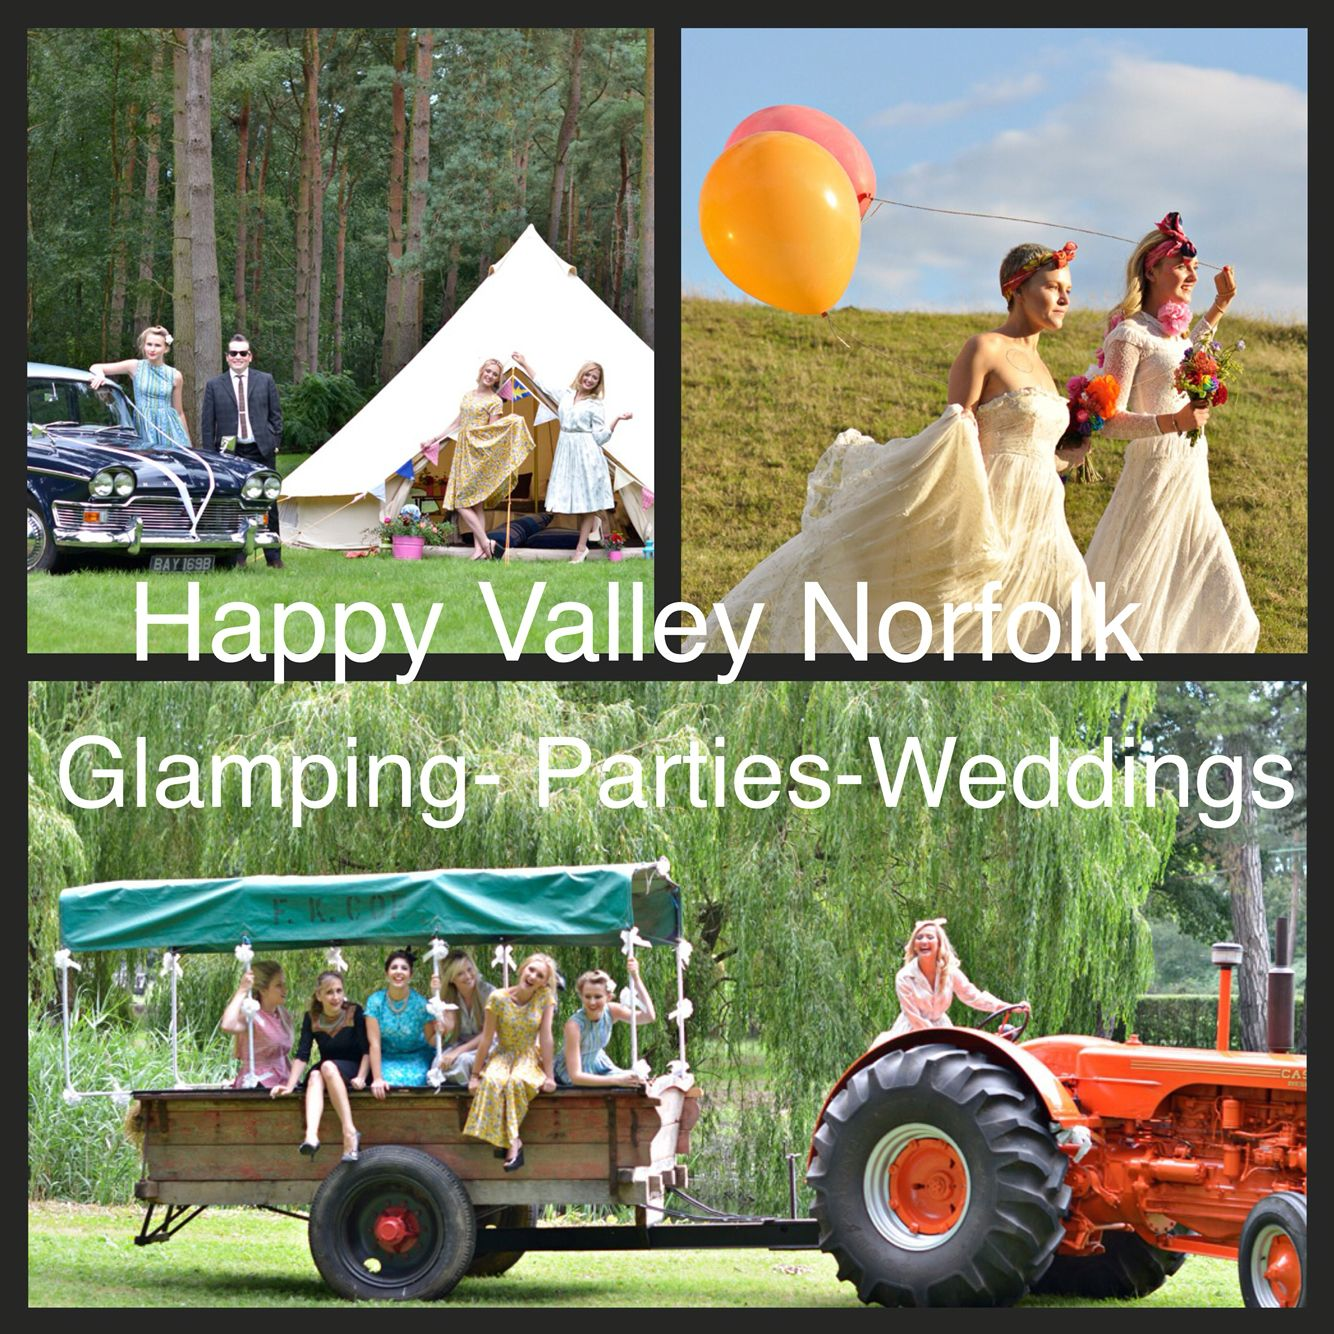 Happy Valley Norfolk Henparties Weddings Glamping Venue Northnorfolk Happydays